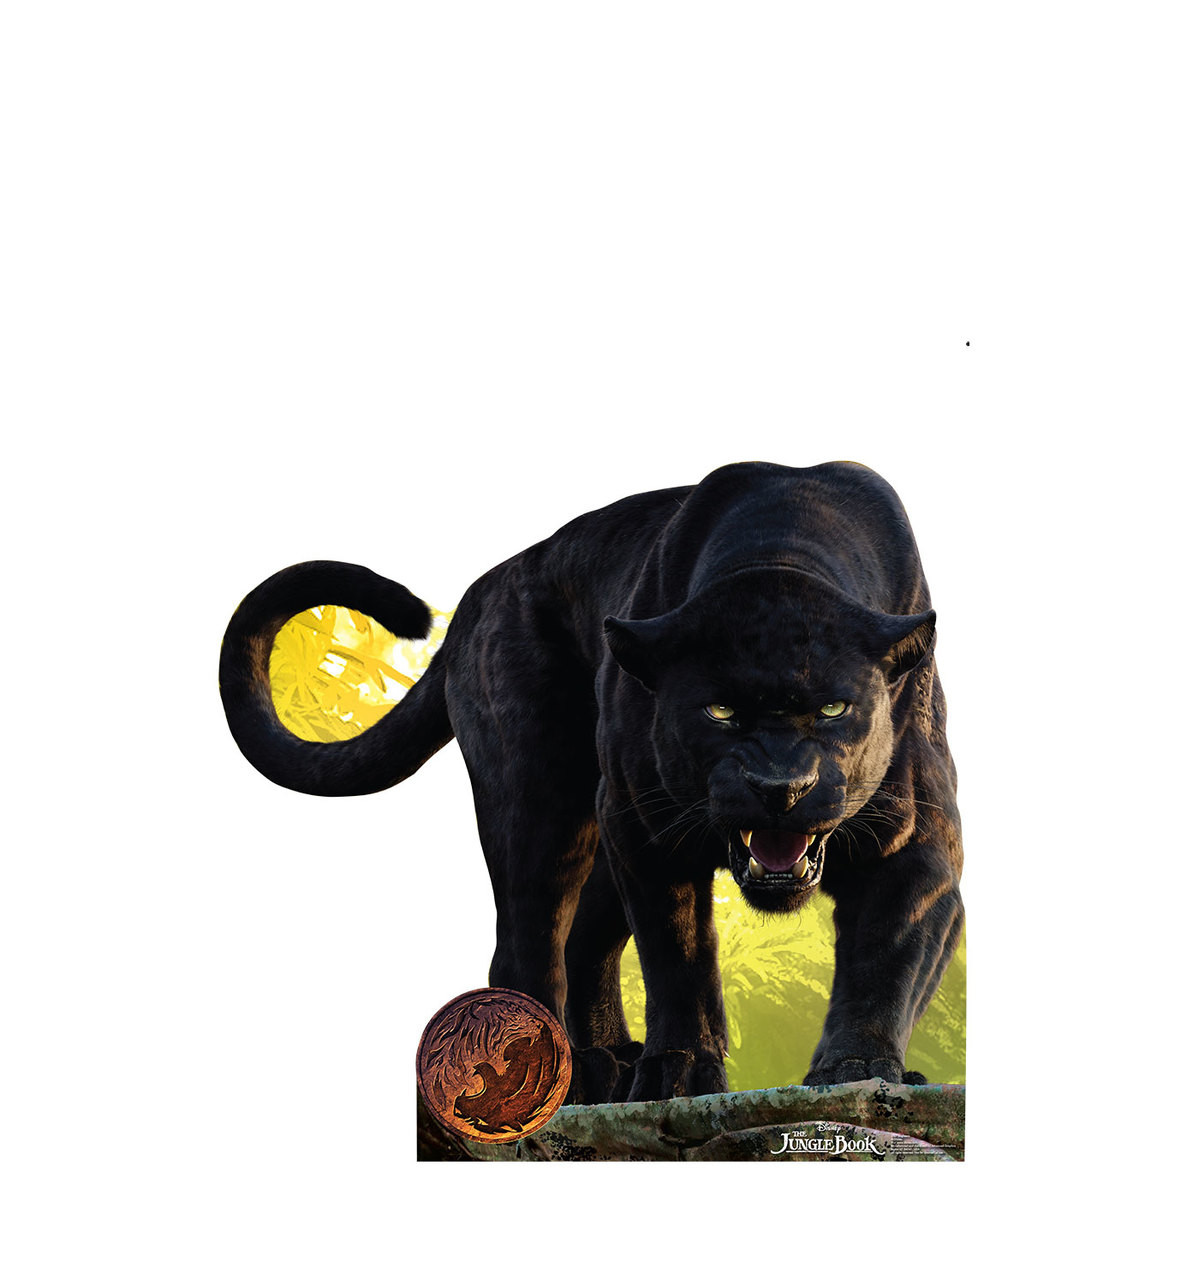 Shere Khan - The Jungle Book - Cardboard Cutout